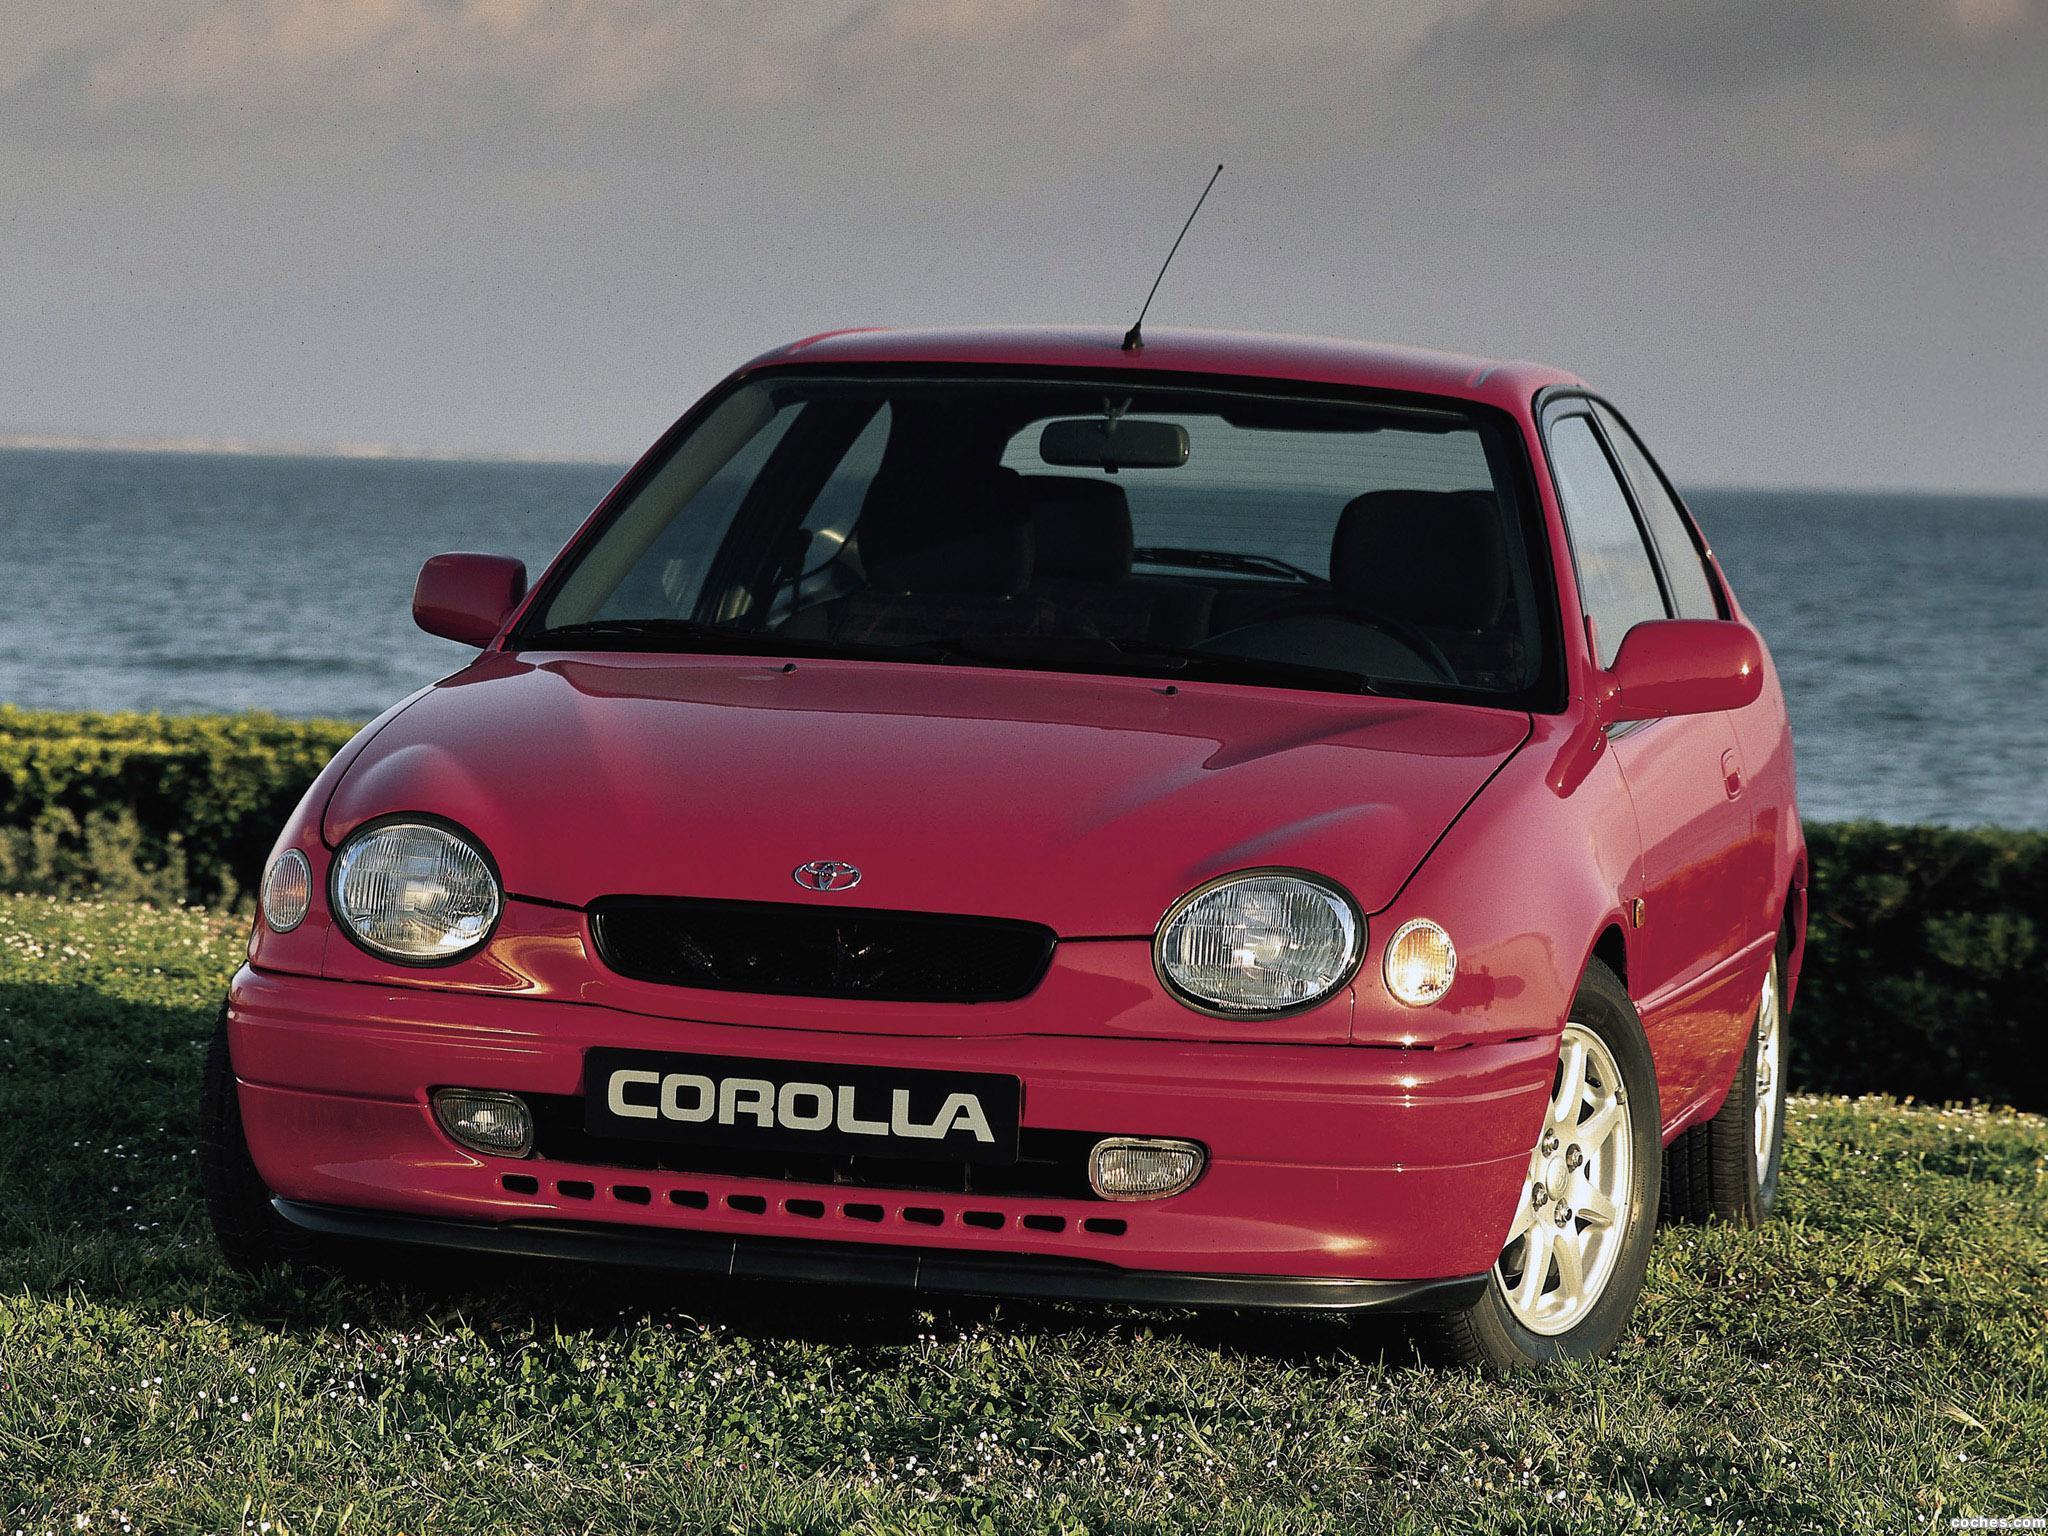 1997 Toyota Corolla Click For Details Sedan 1992